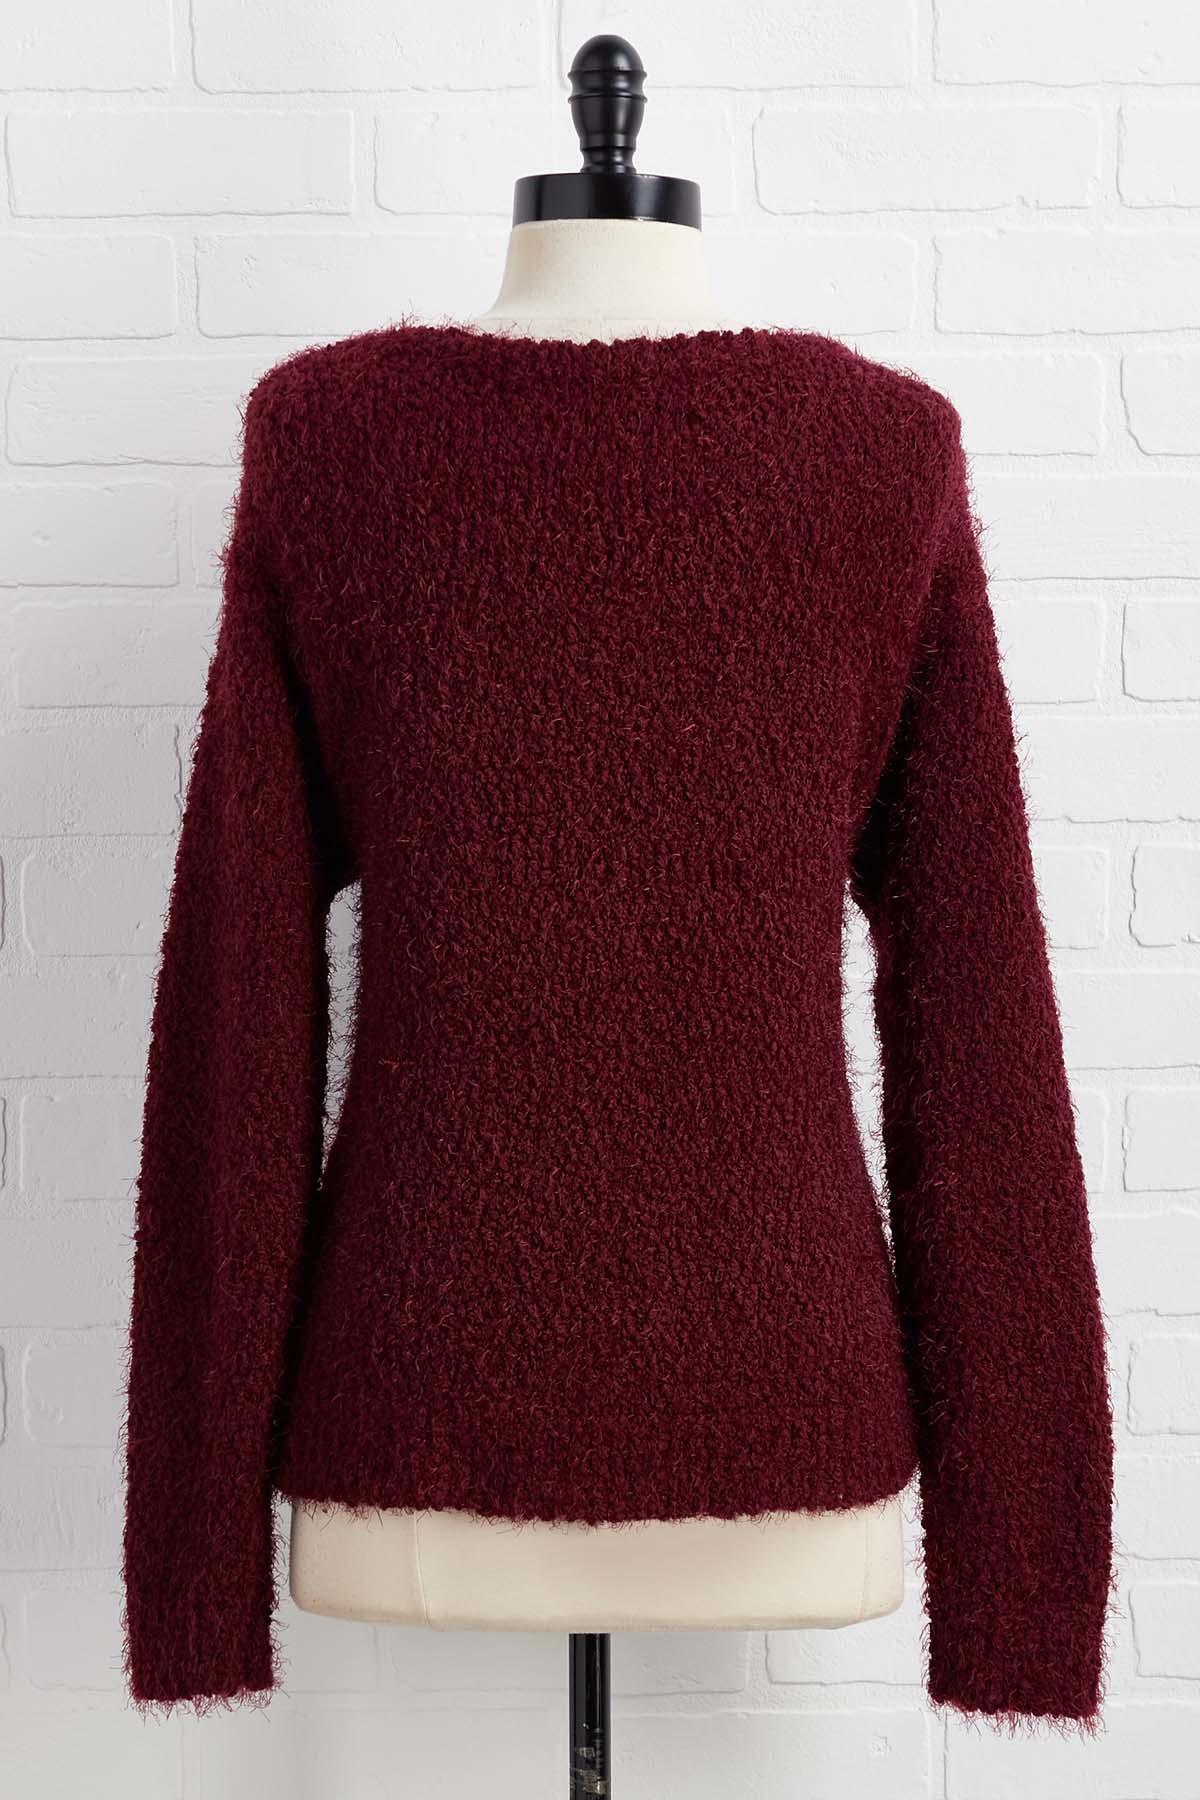 Take A Chill Pill Sweater